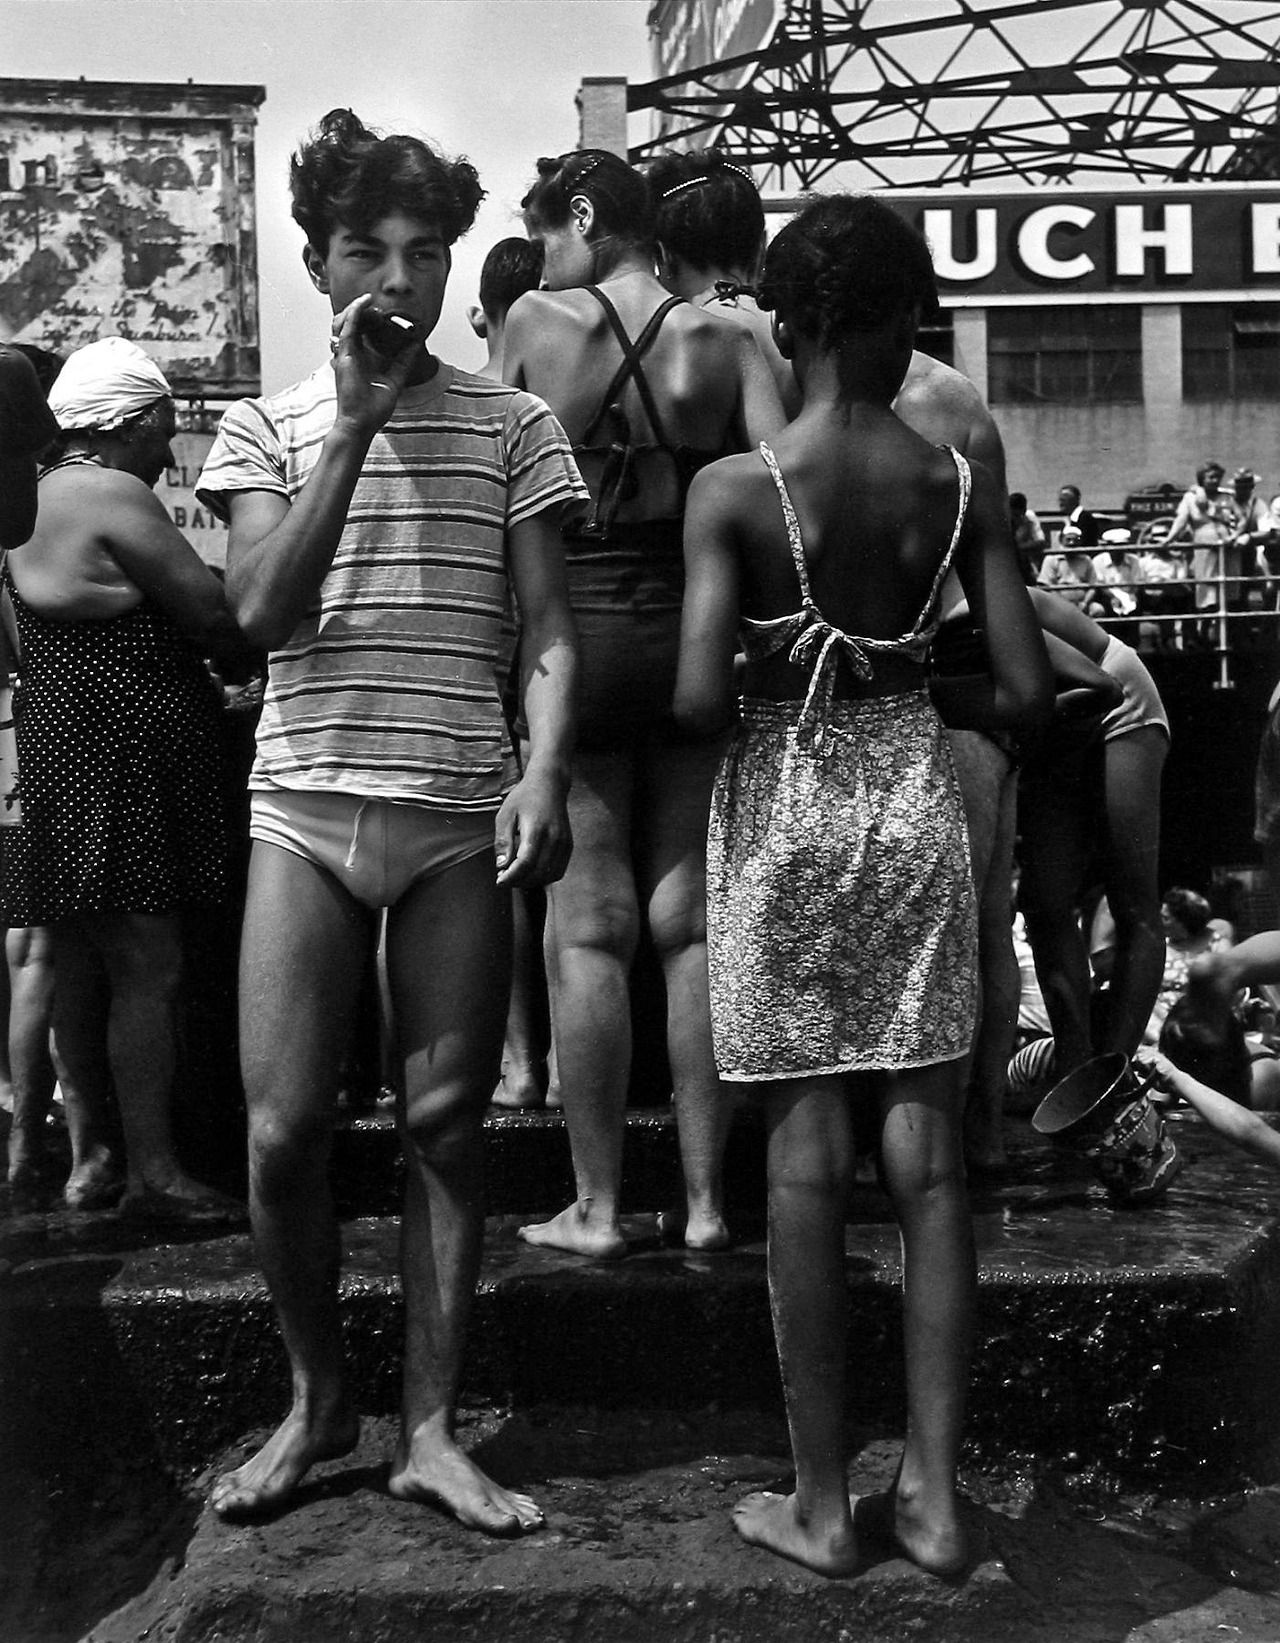 Smoking, Coney Island, Photo by Morris Engel, 1948